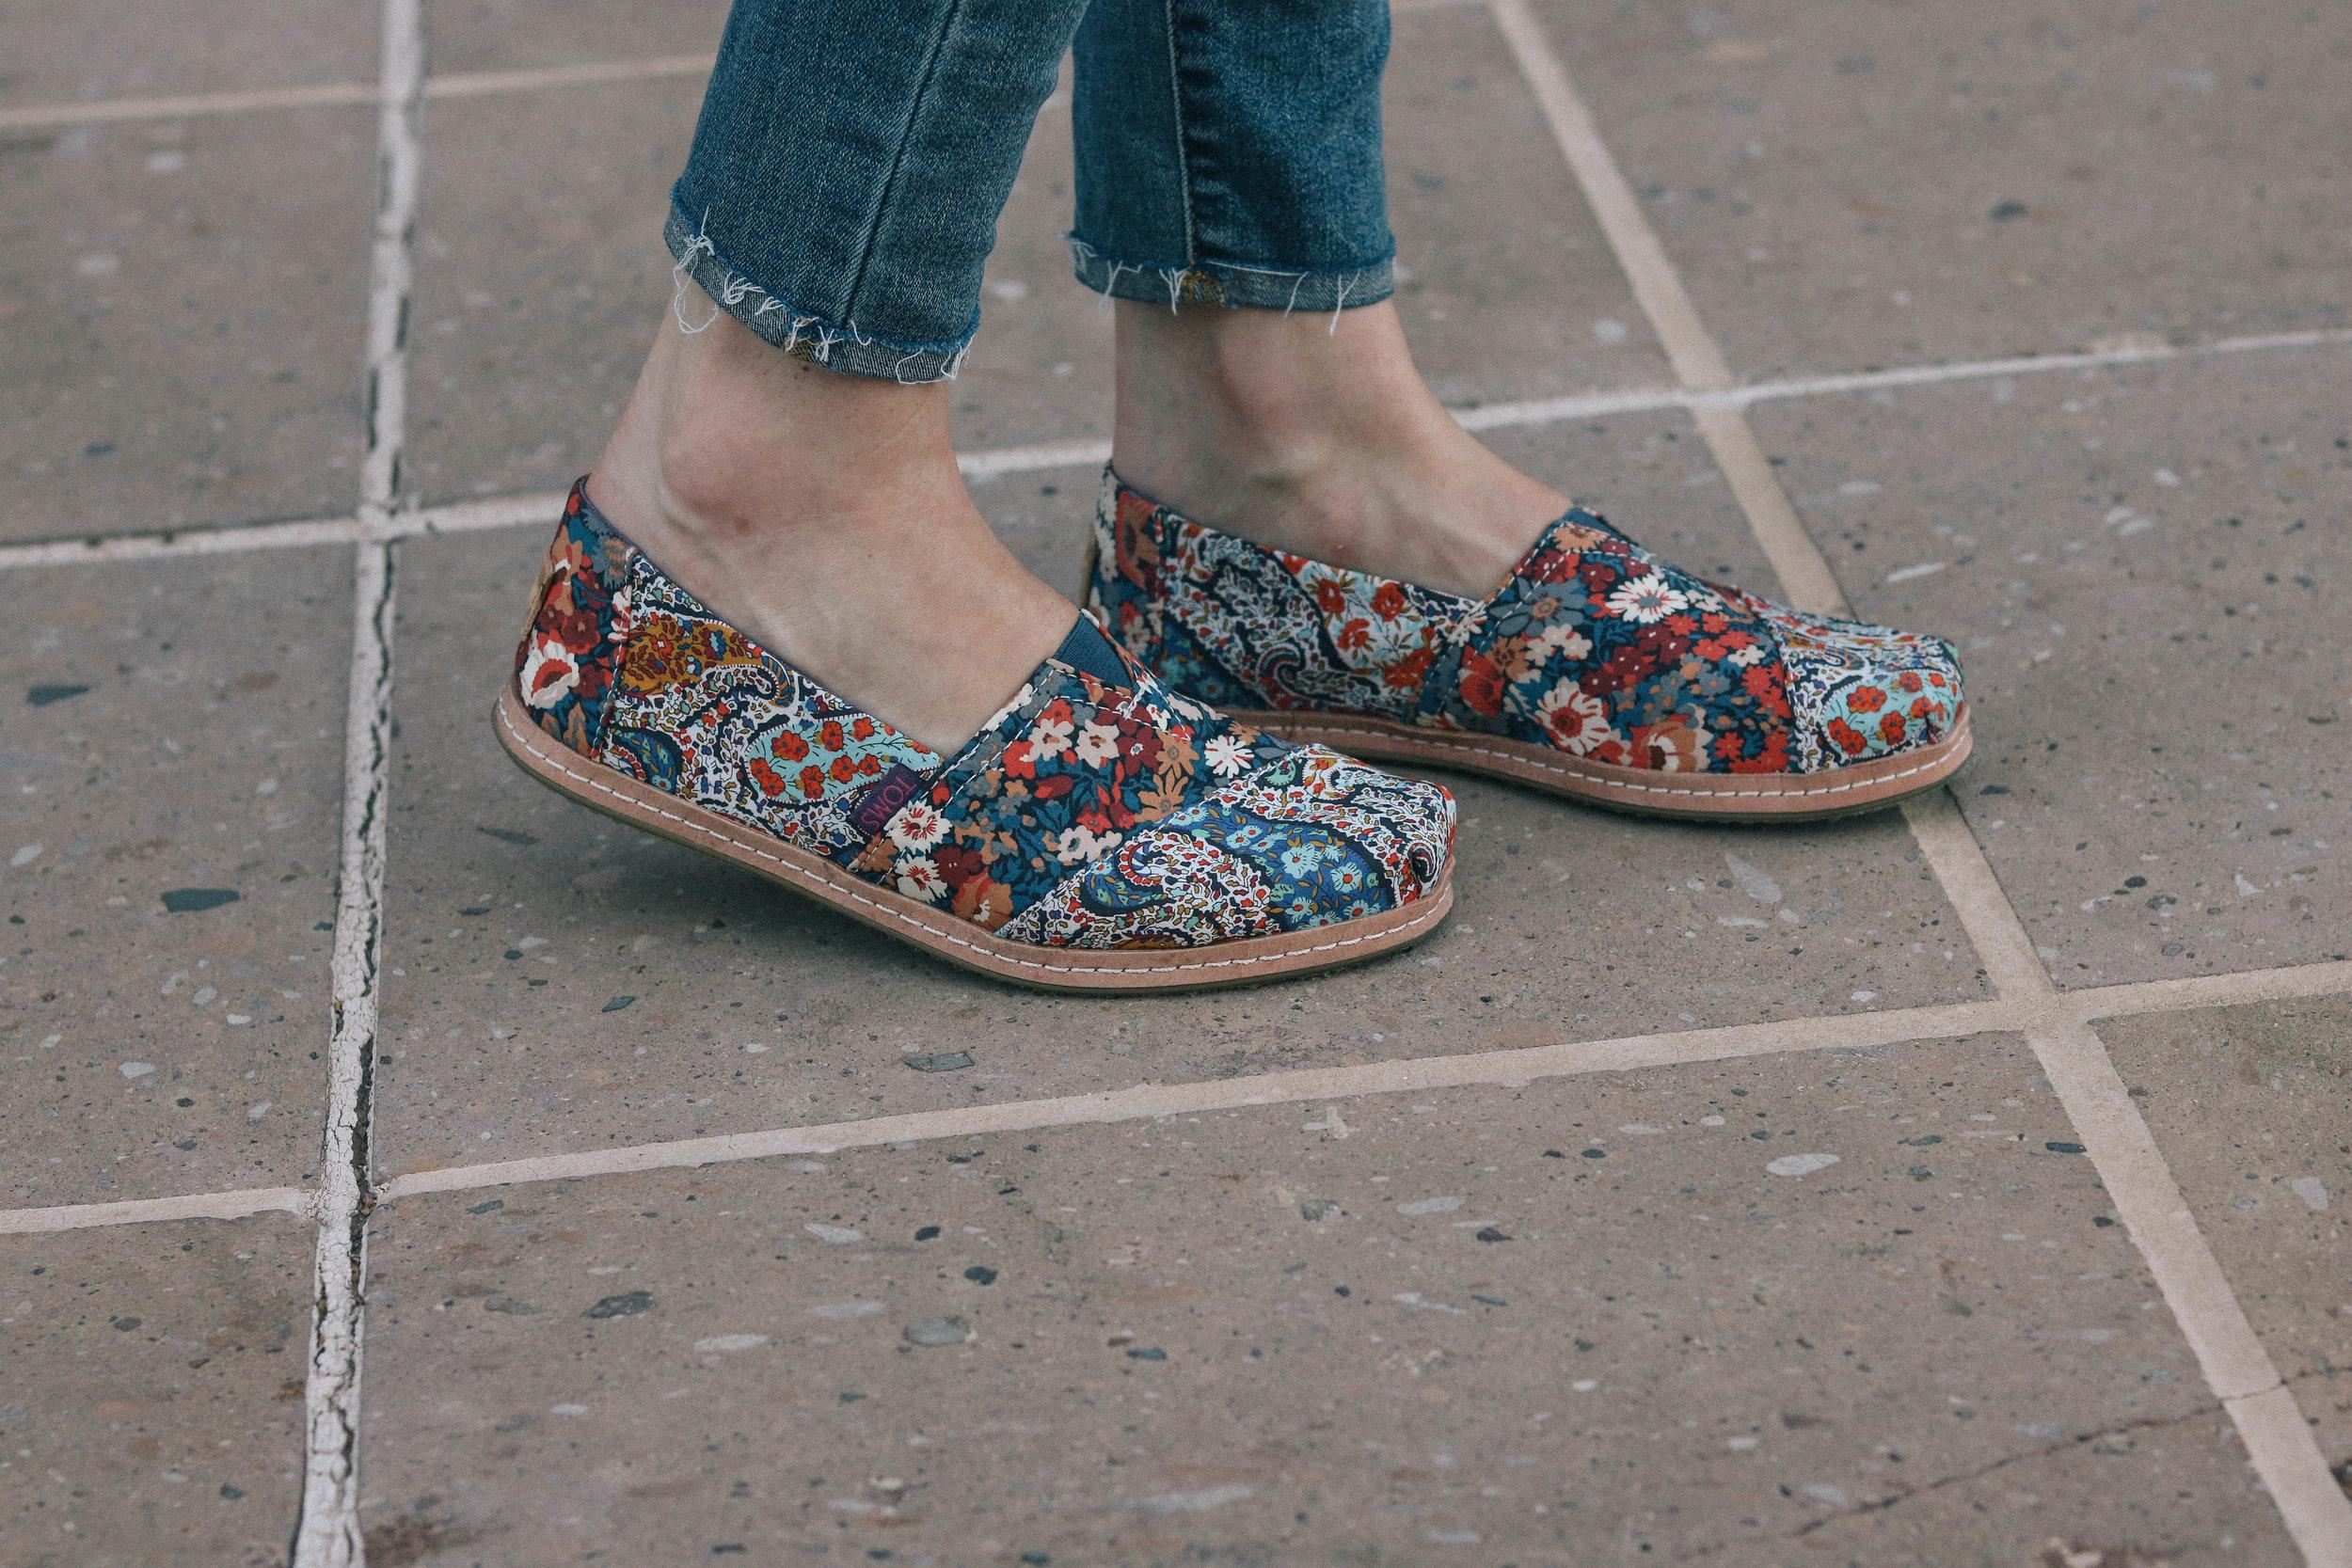 bb-fall-footwear-005 (1 of 1).jpg